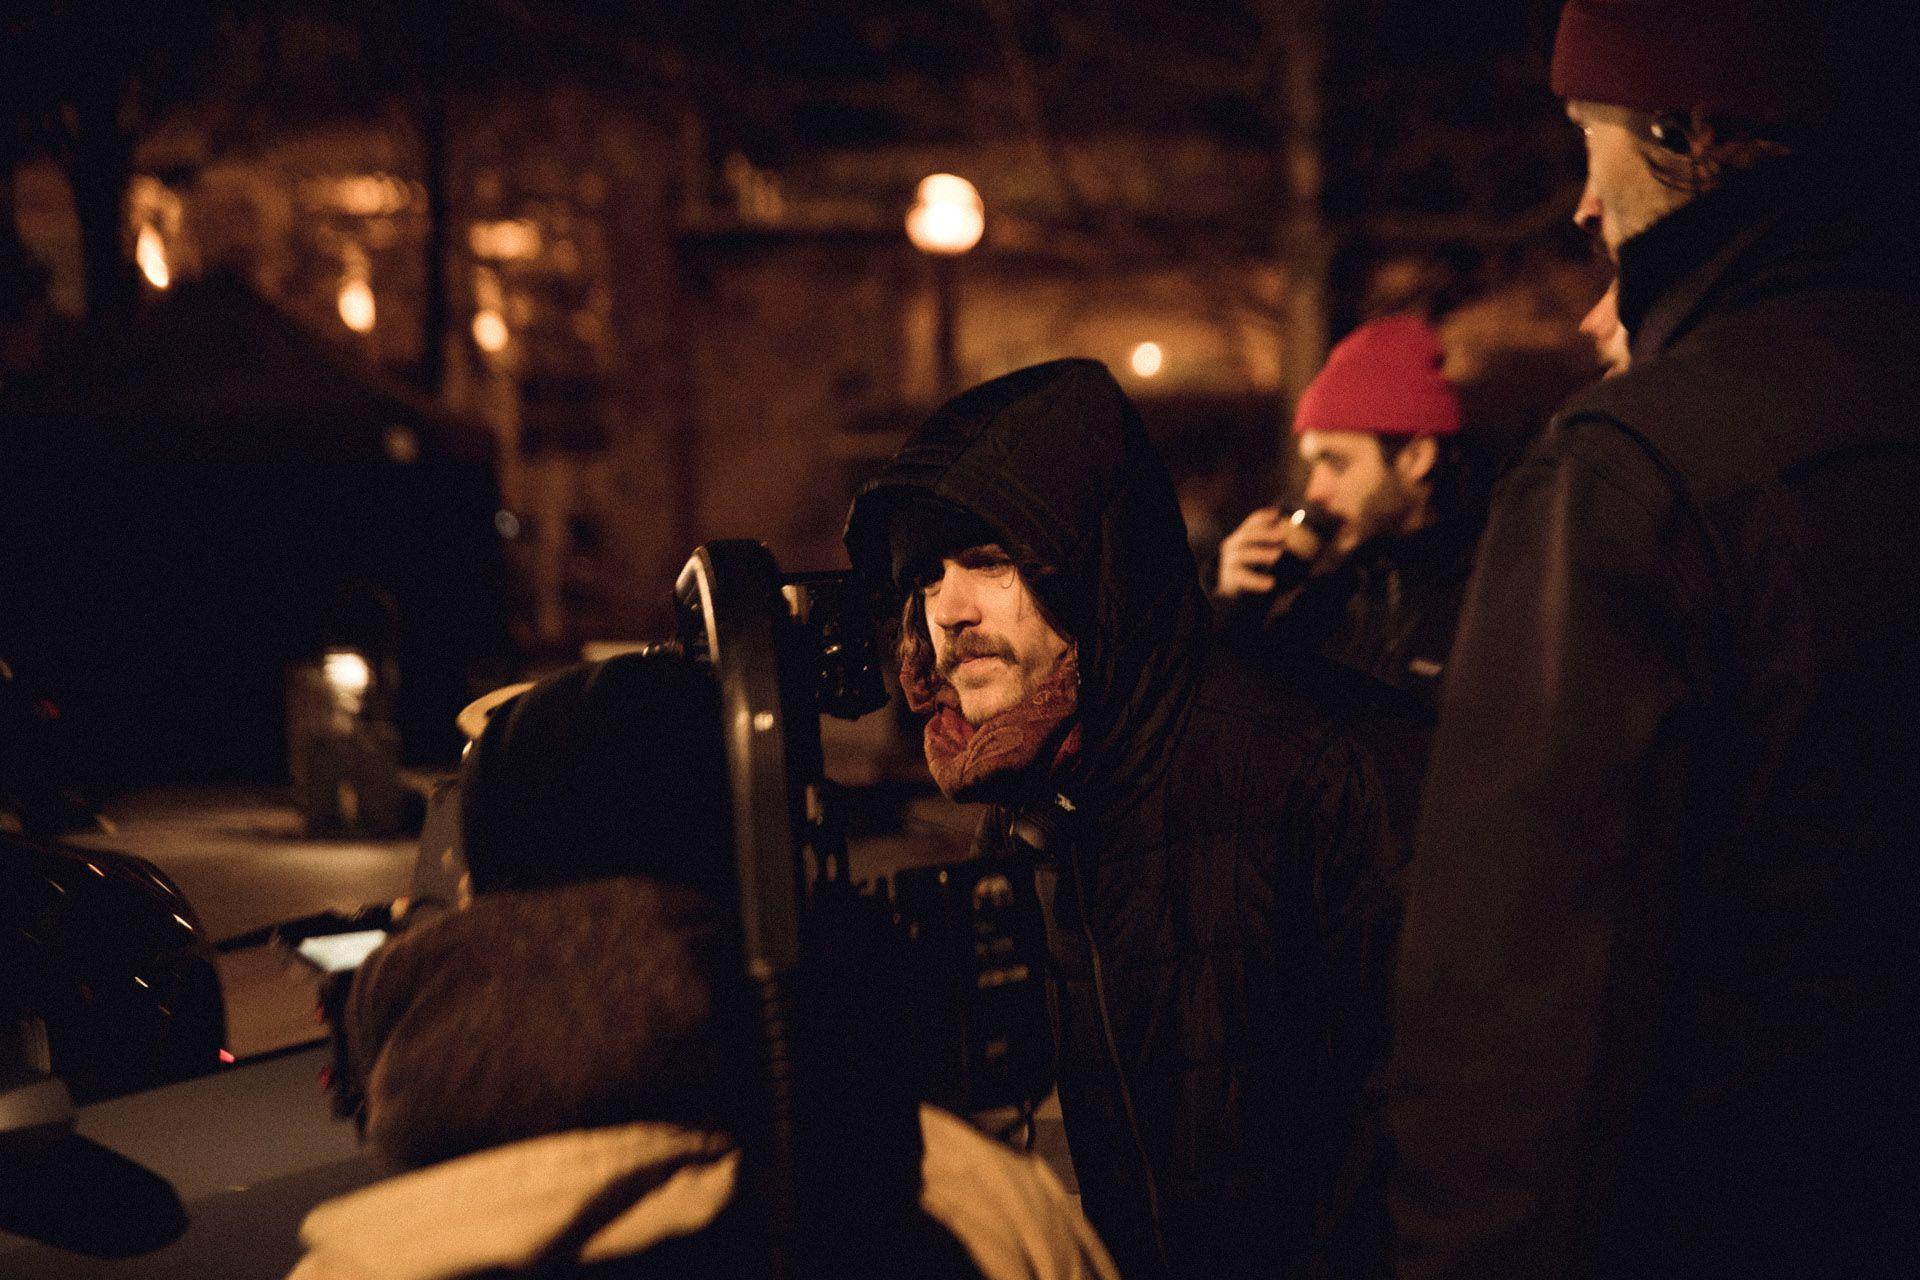 Vincent Ruel-Cote from Les Gamins behind the scenes filming TV series La Loi C'est La Loi at night with TV5 Unis